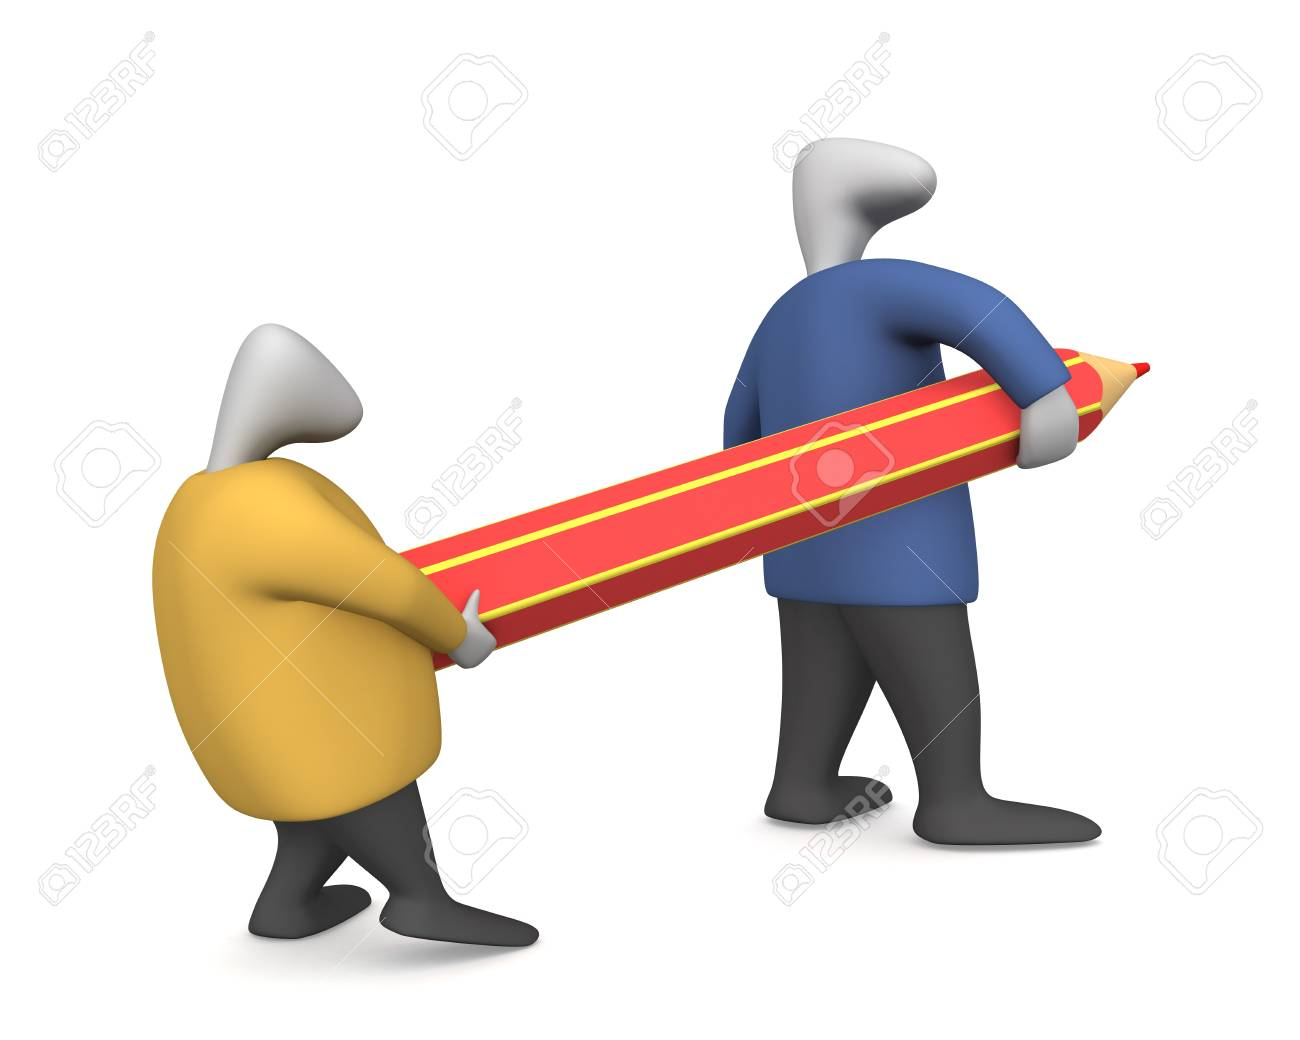 Threedimensional image - two men drag the pencil. - 8195601